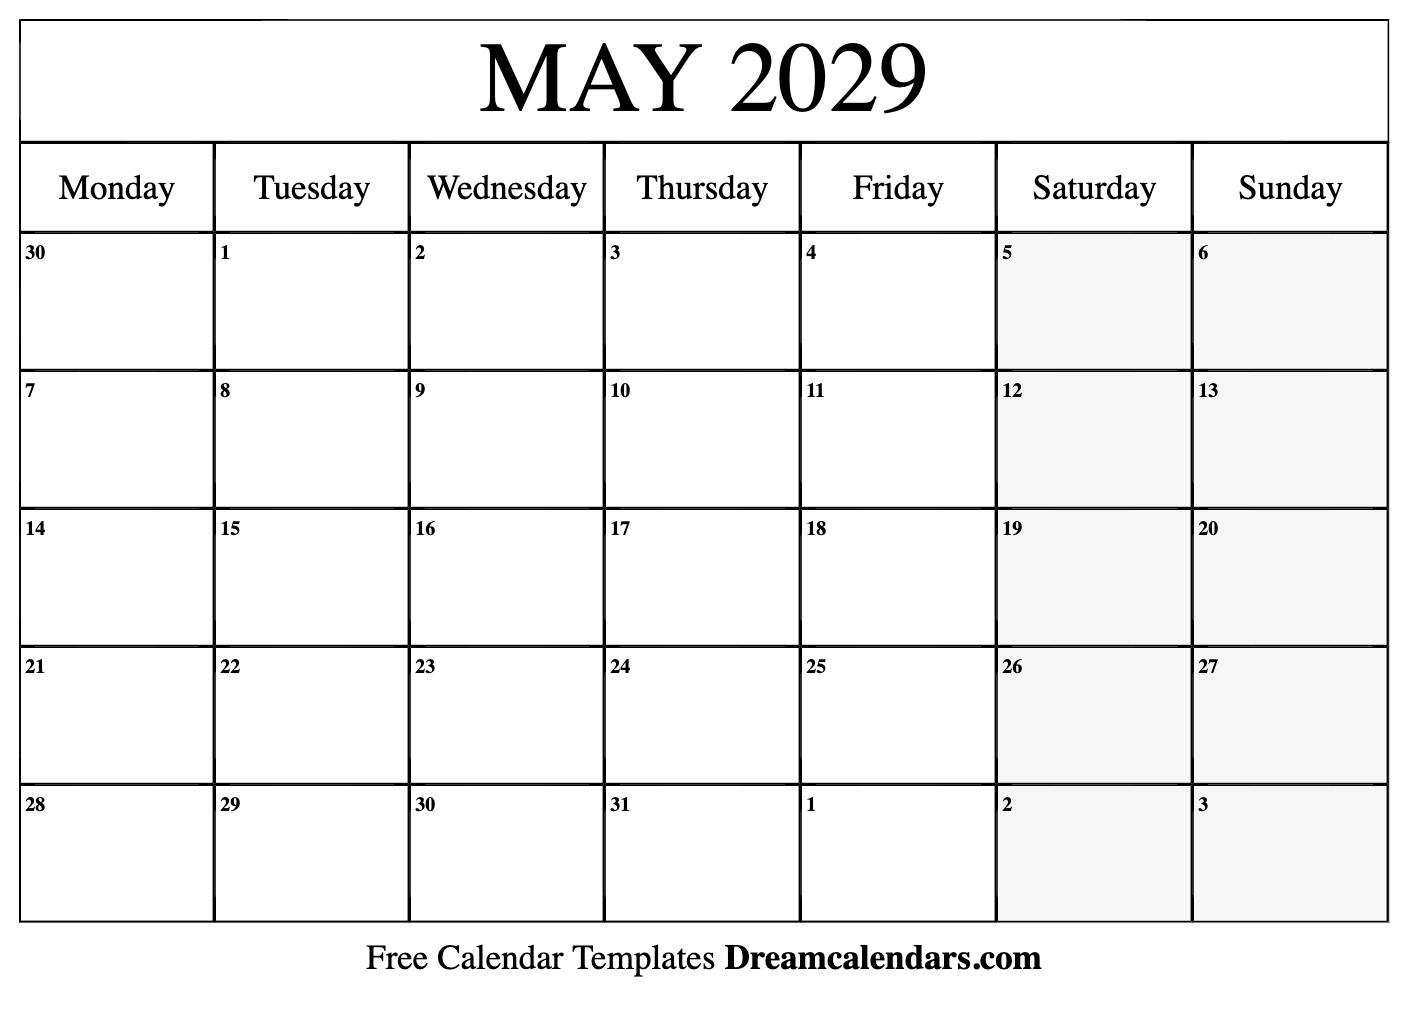 Free Blank May 2029 Printable Calendar inside Blank Sunday Through Saturday Calendar